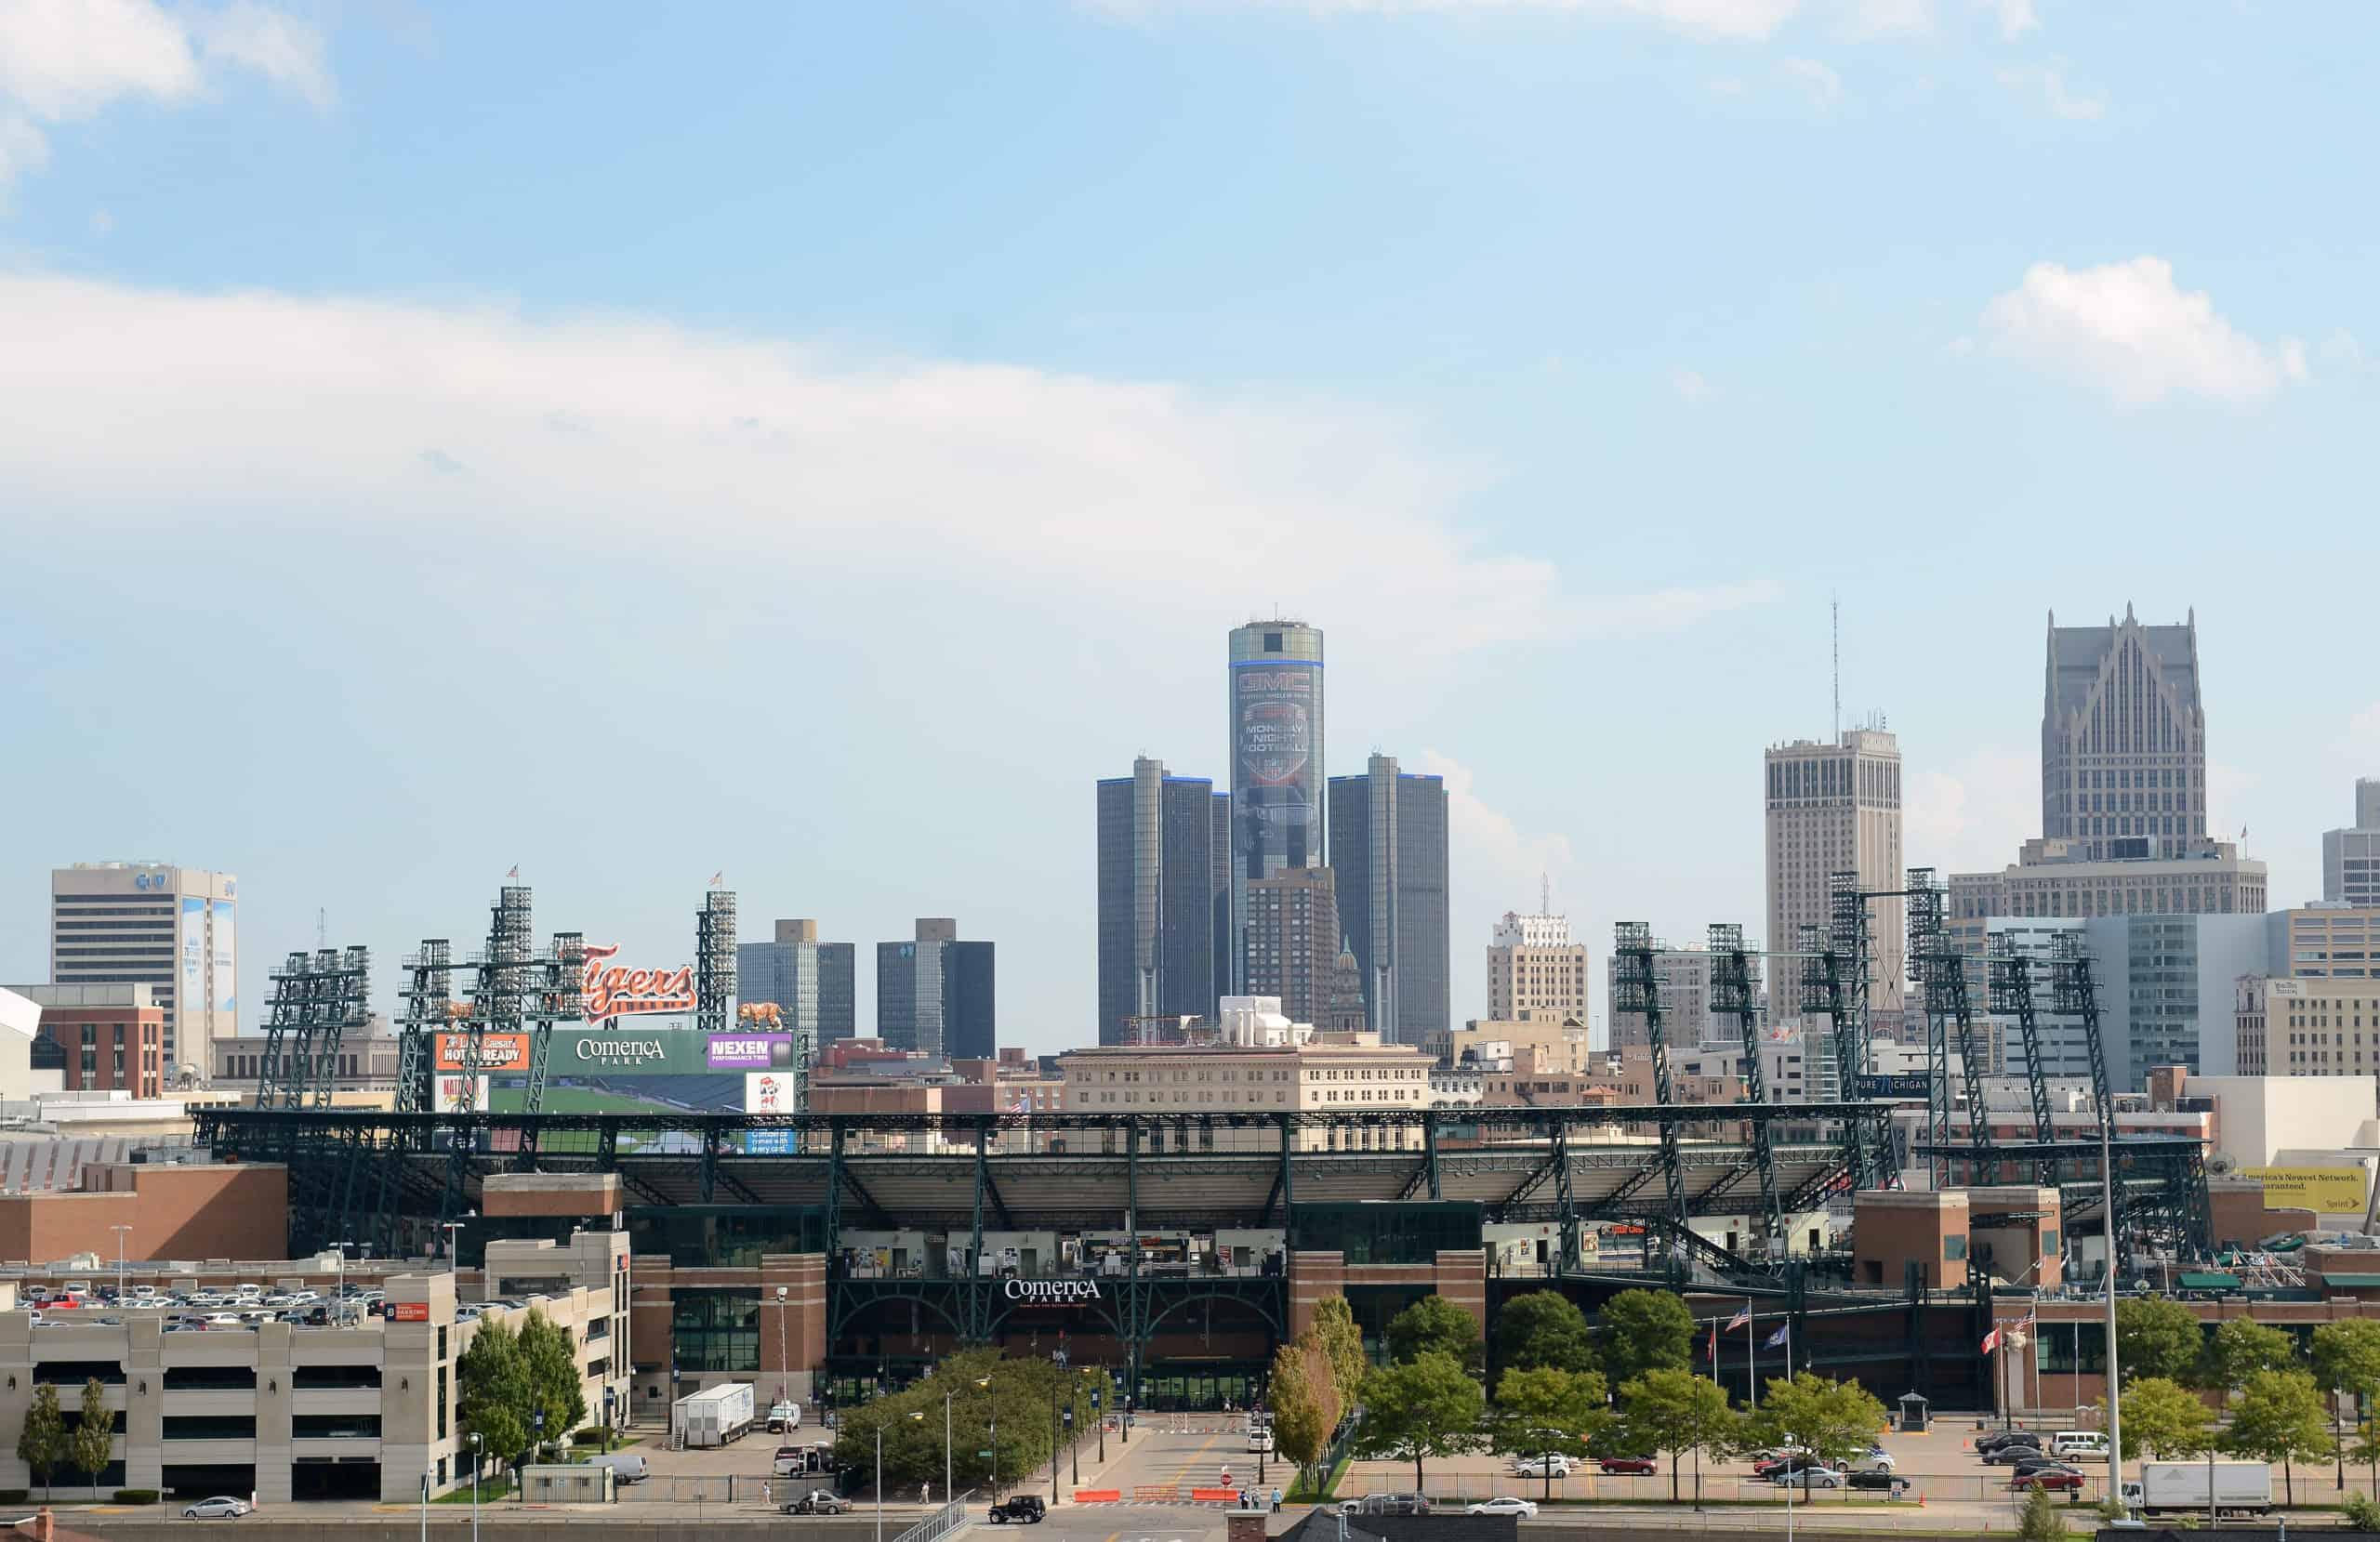 Former Nike Designer Plans To Reopen First HBCU In Detroit Focusing On Design